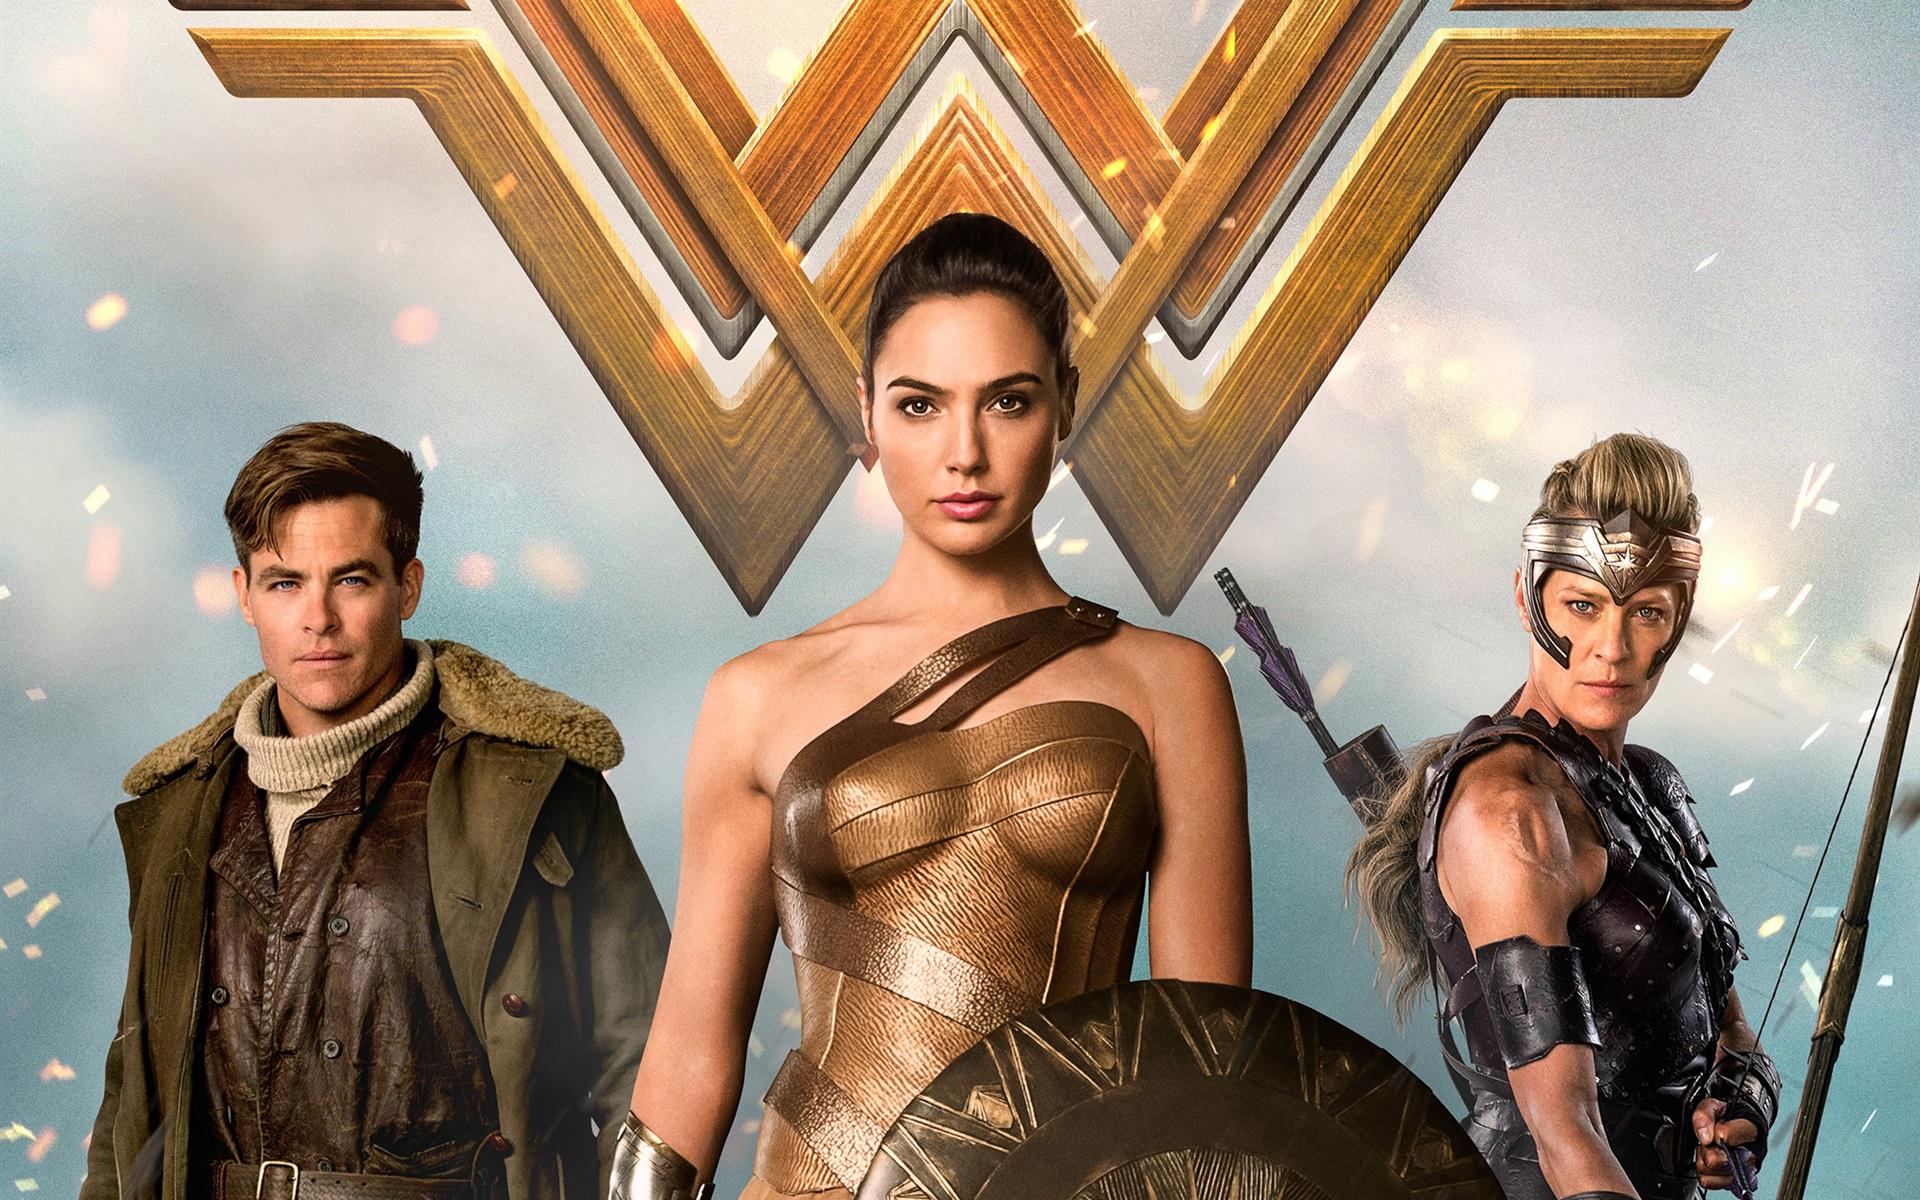 https://ru.best-wallpaper.net/wallpaper/1920x1200/1708/Wonder-Woman-Marvel-movie-2017_1920x1200.jpg